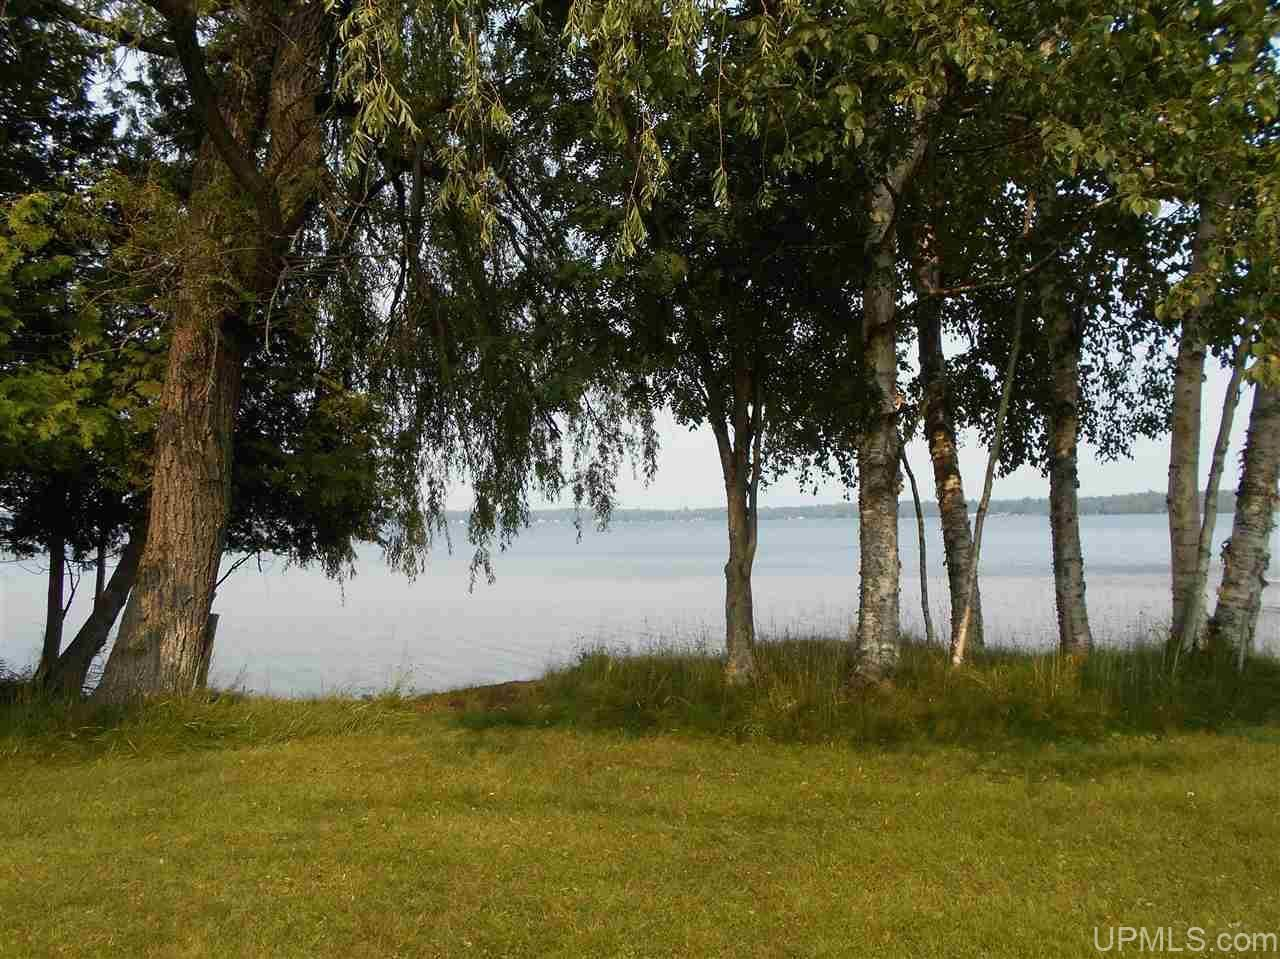 Photo of 628N West Gulliver Lake Rd, Gulliver, MI 49840 (MLS # 1128965)